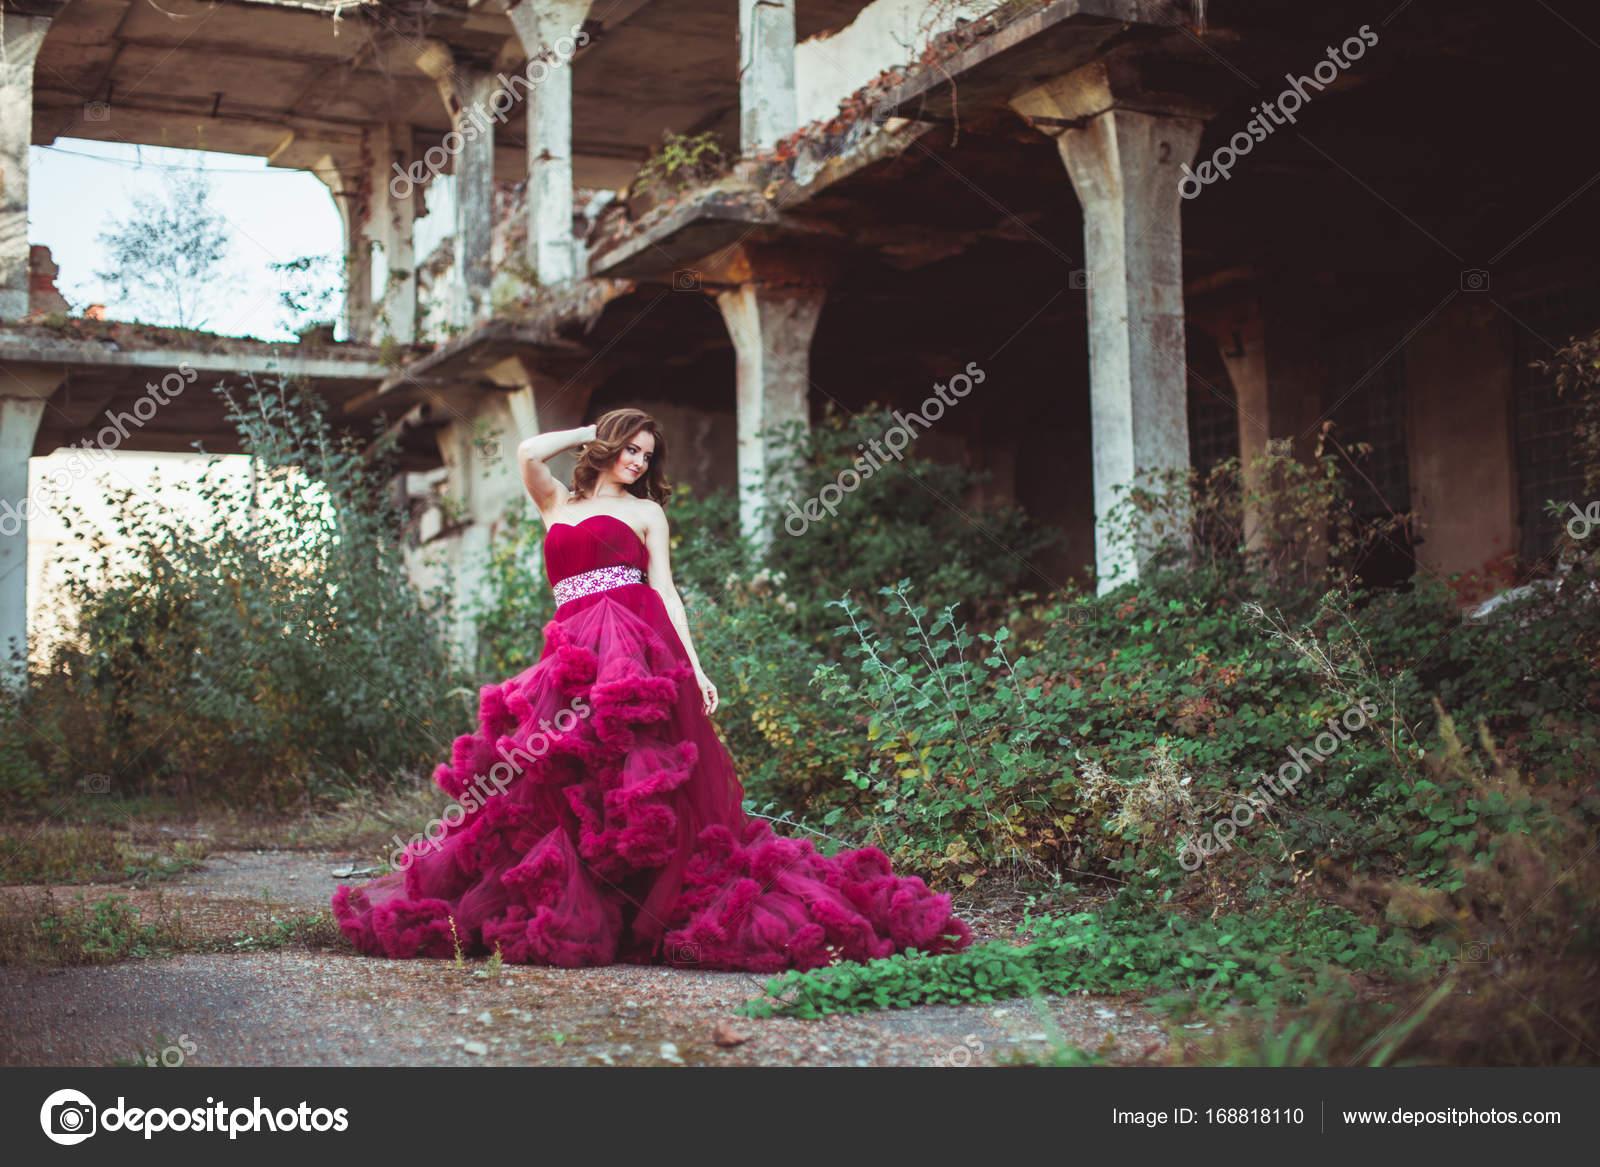 662317afc6e Lady σε μια πολυτελή πλούσια καιρό ροζ φόρεμα εξωτερική. Γυναίκα με κόκκινο  θολό φόρεμα - σύμβολο της ομορφιάς και την ανανέωση της κοινωνίας — Εικόνα  από ...